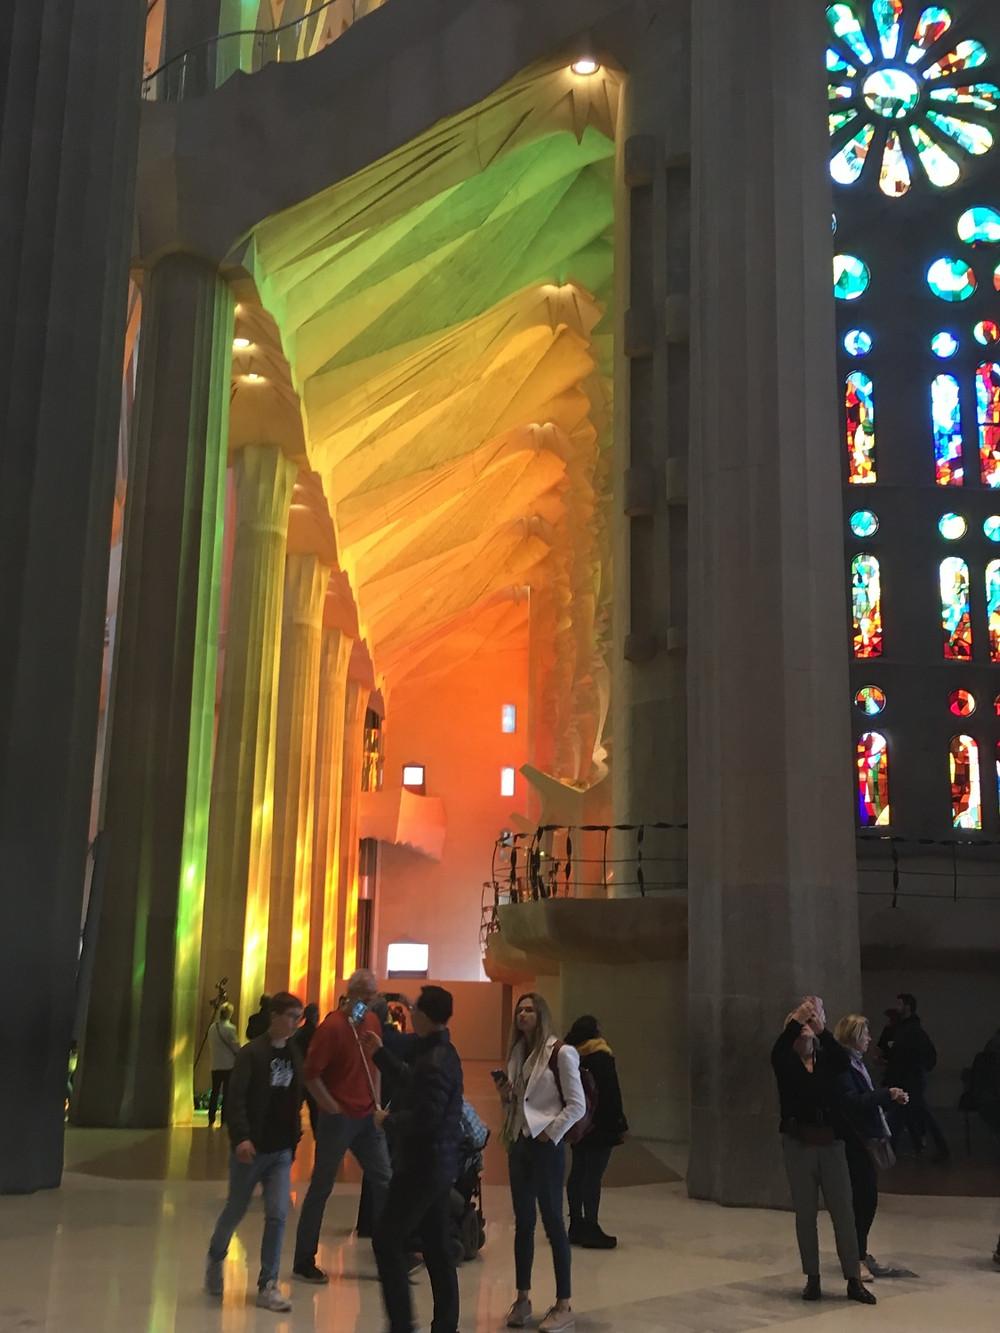 Interior of La Sagrada Familia